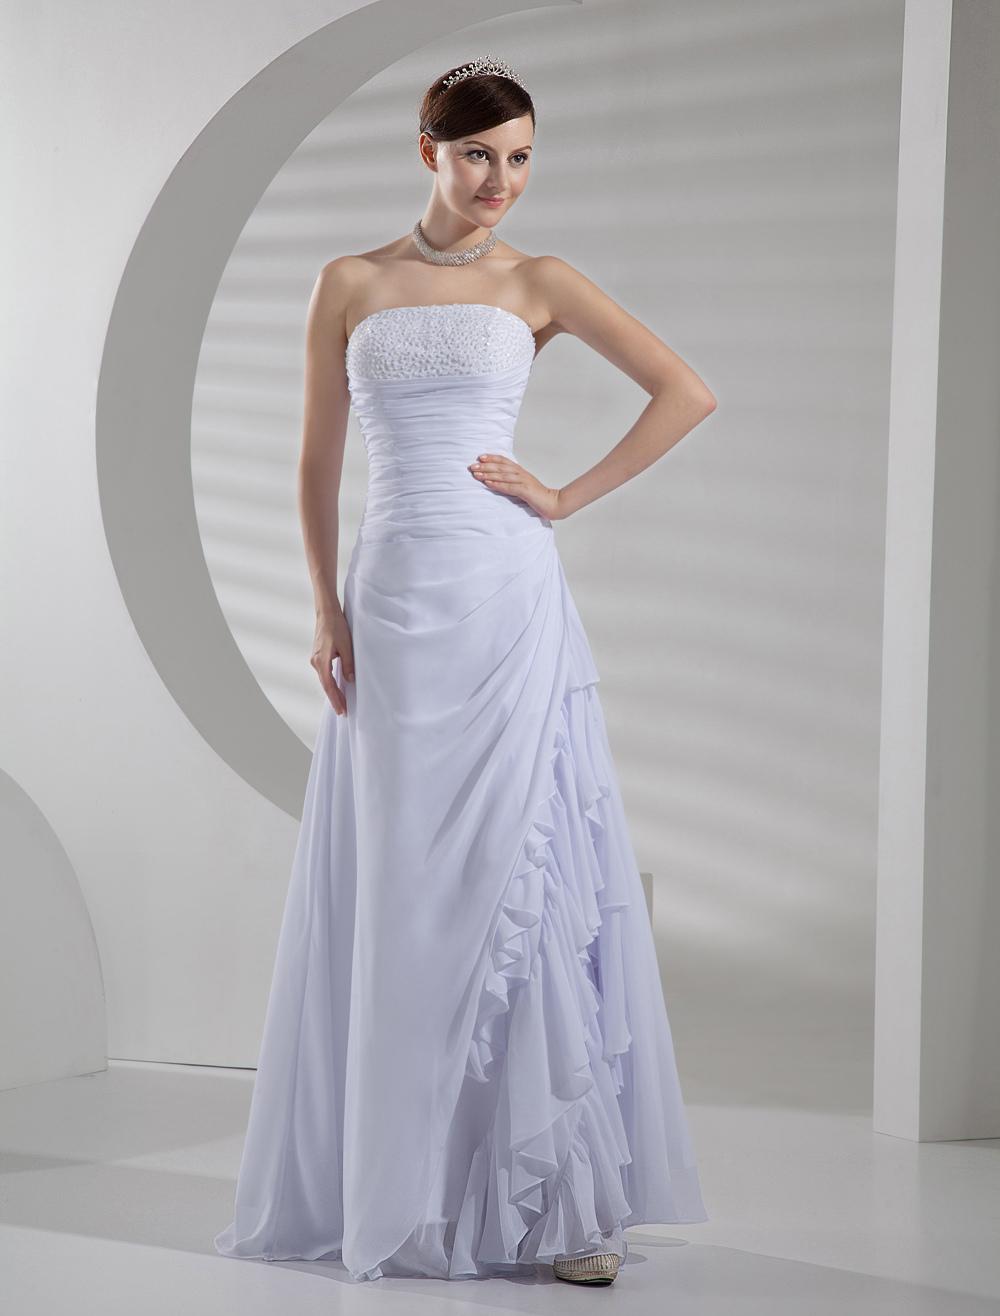 Chiffon A-line Wedding Dress Strapless Beaded Ruffles Side Lace Up Bridal Gown (Cheap Wedding Dress) photo